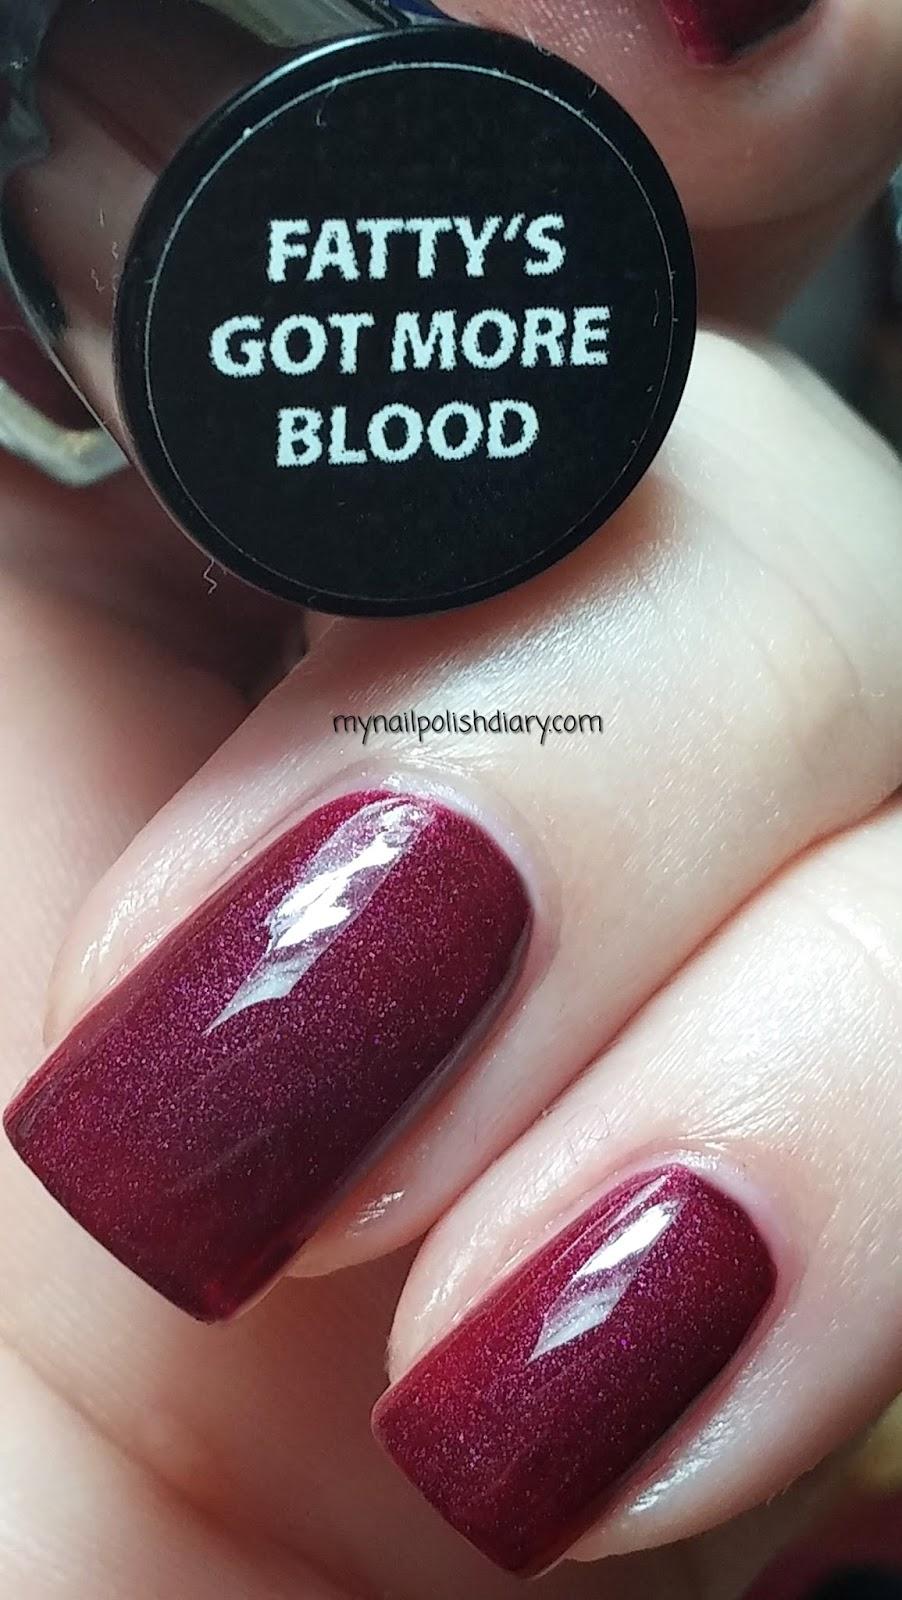 My Nail Polish Diary: ManGlaze Fatty\'s Got More Blood with Top Coat